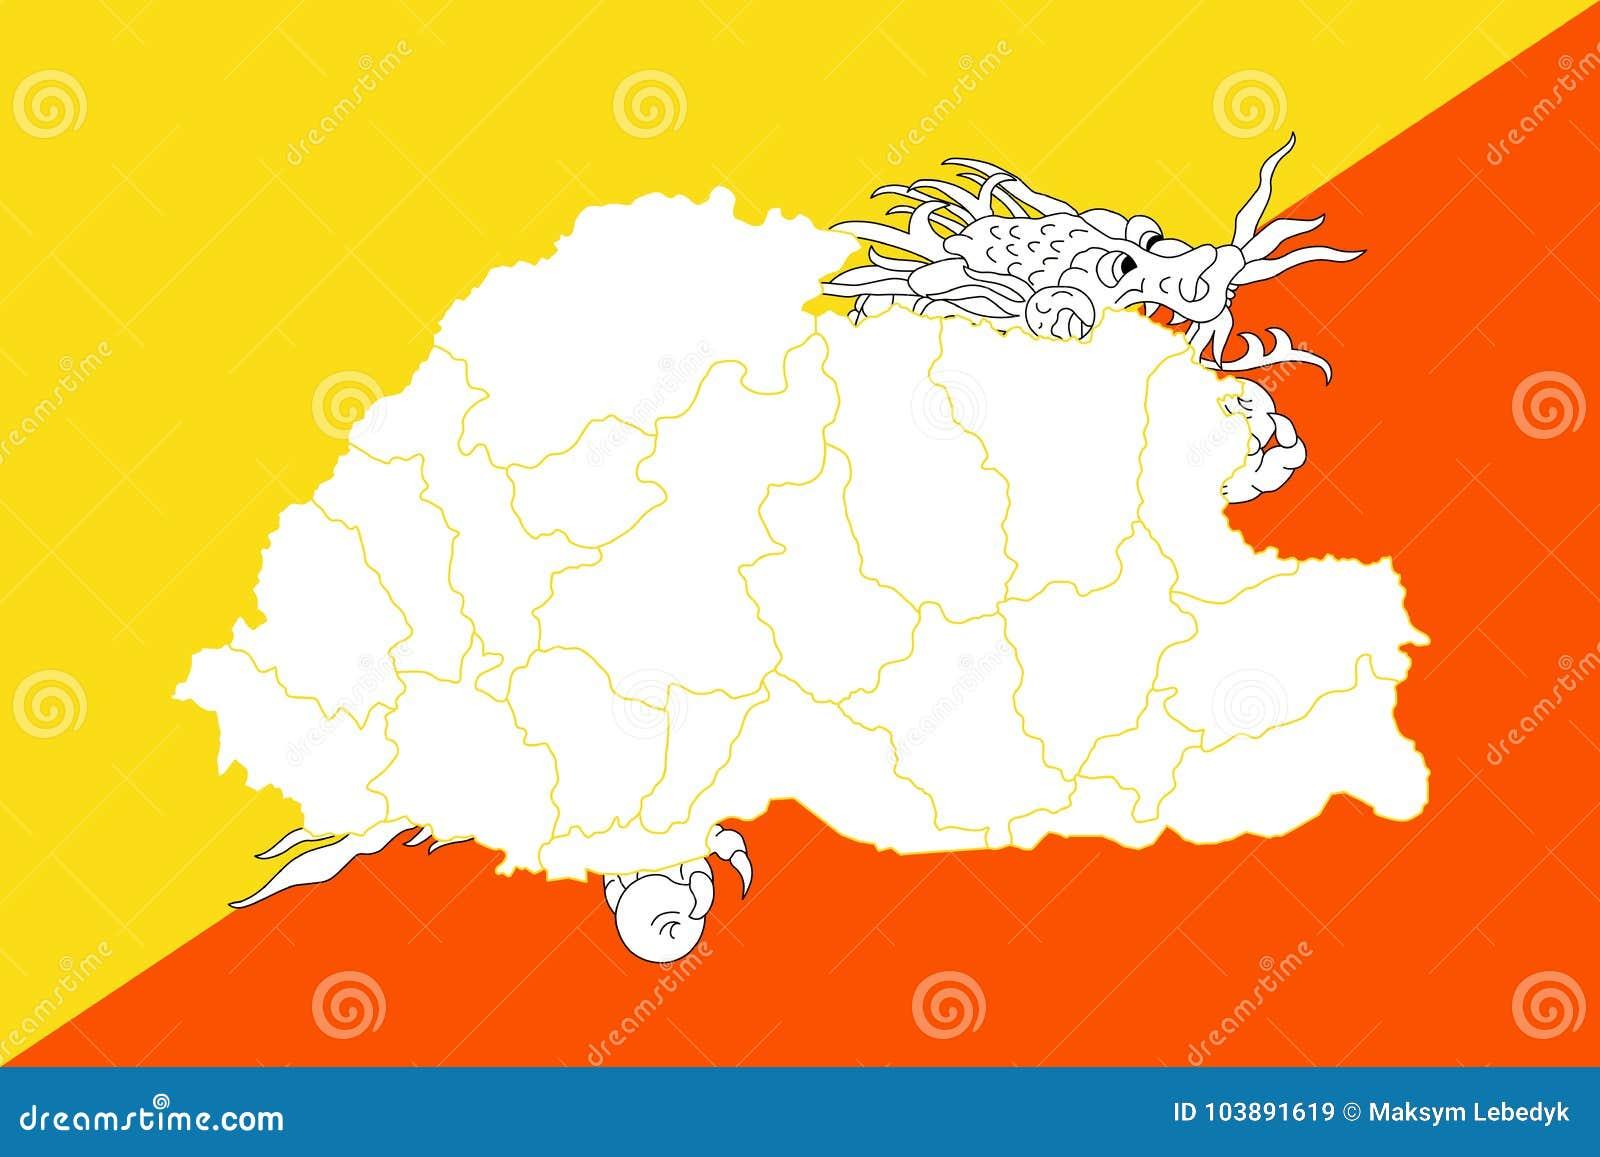 World Map Bhutan.Map And Flag Of Bhutan Stock Illustration Illustration Of